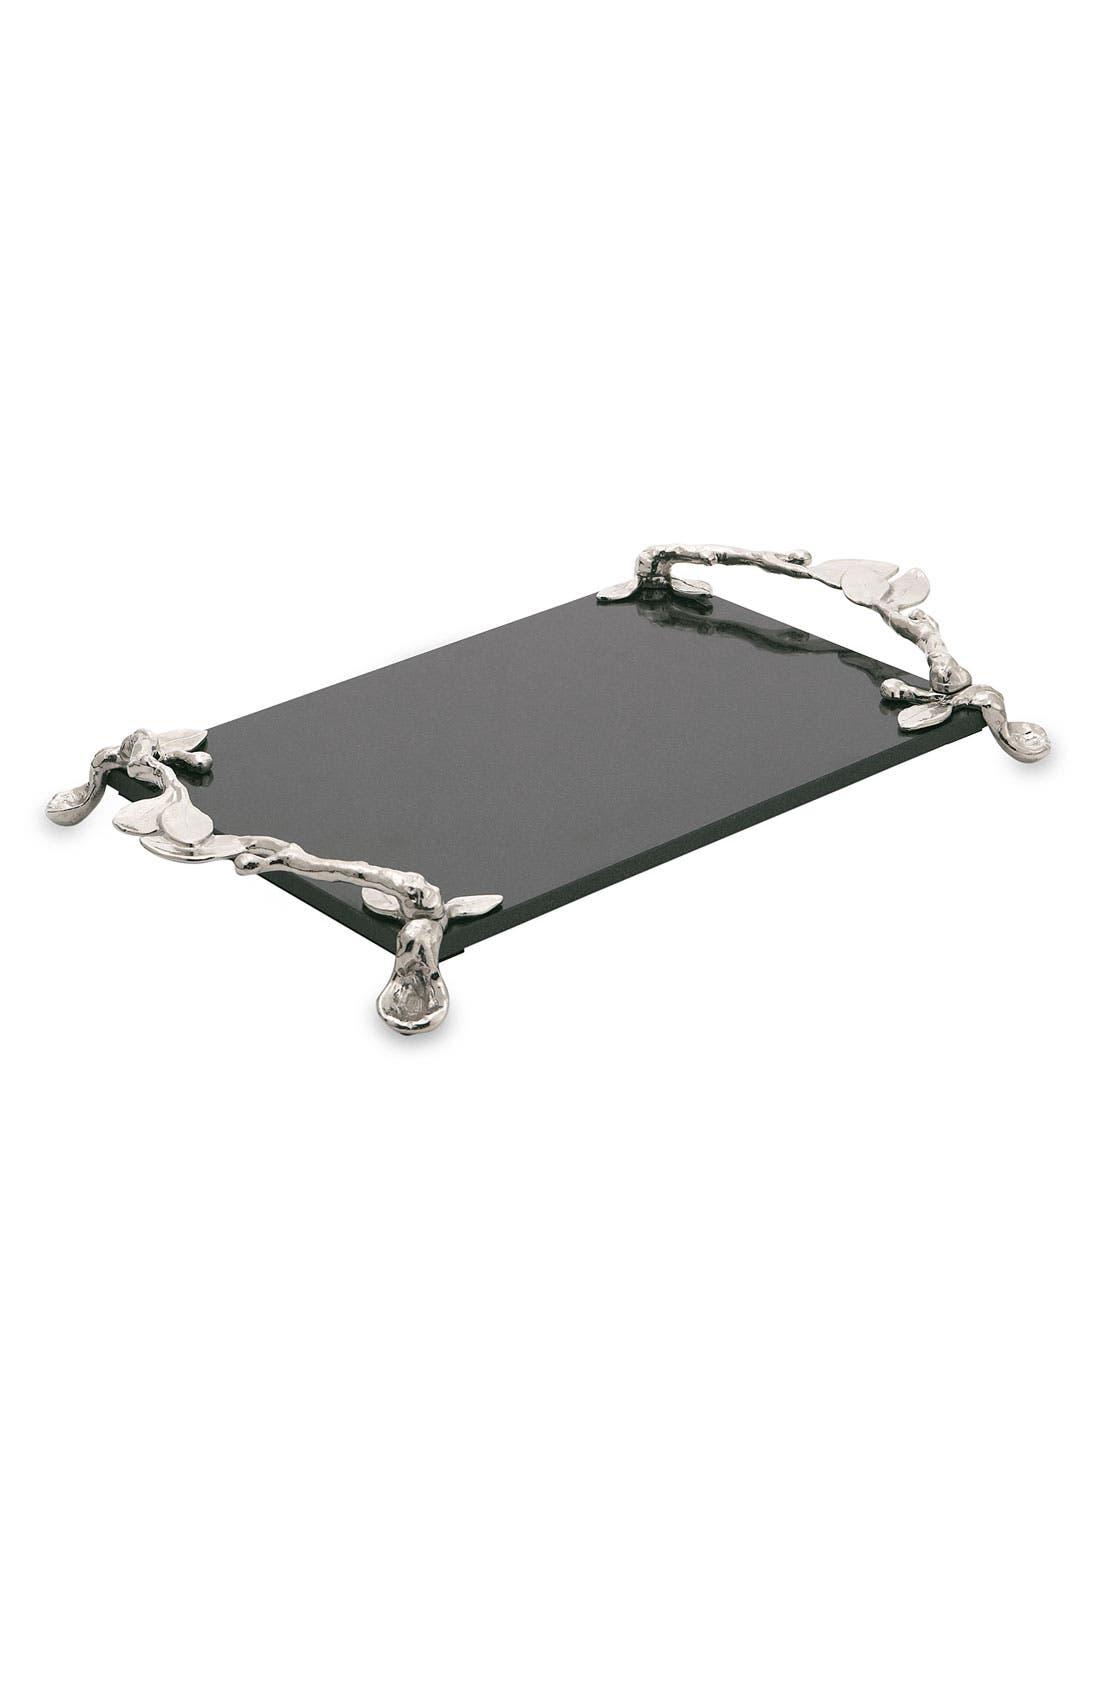 Alternate Image 1 Selected - Michael Aram 'Sleepy Hollow' Granite Cheese Board